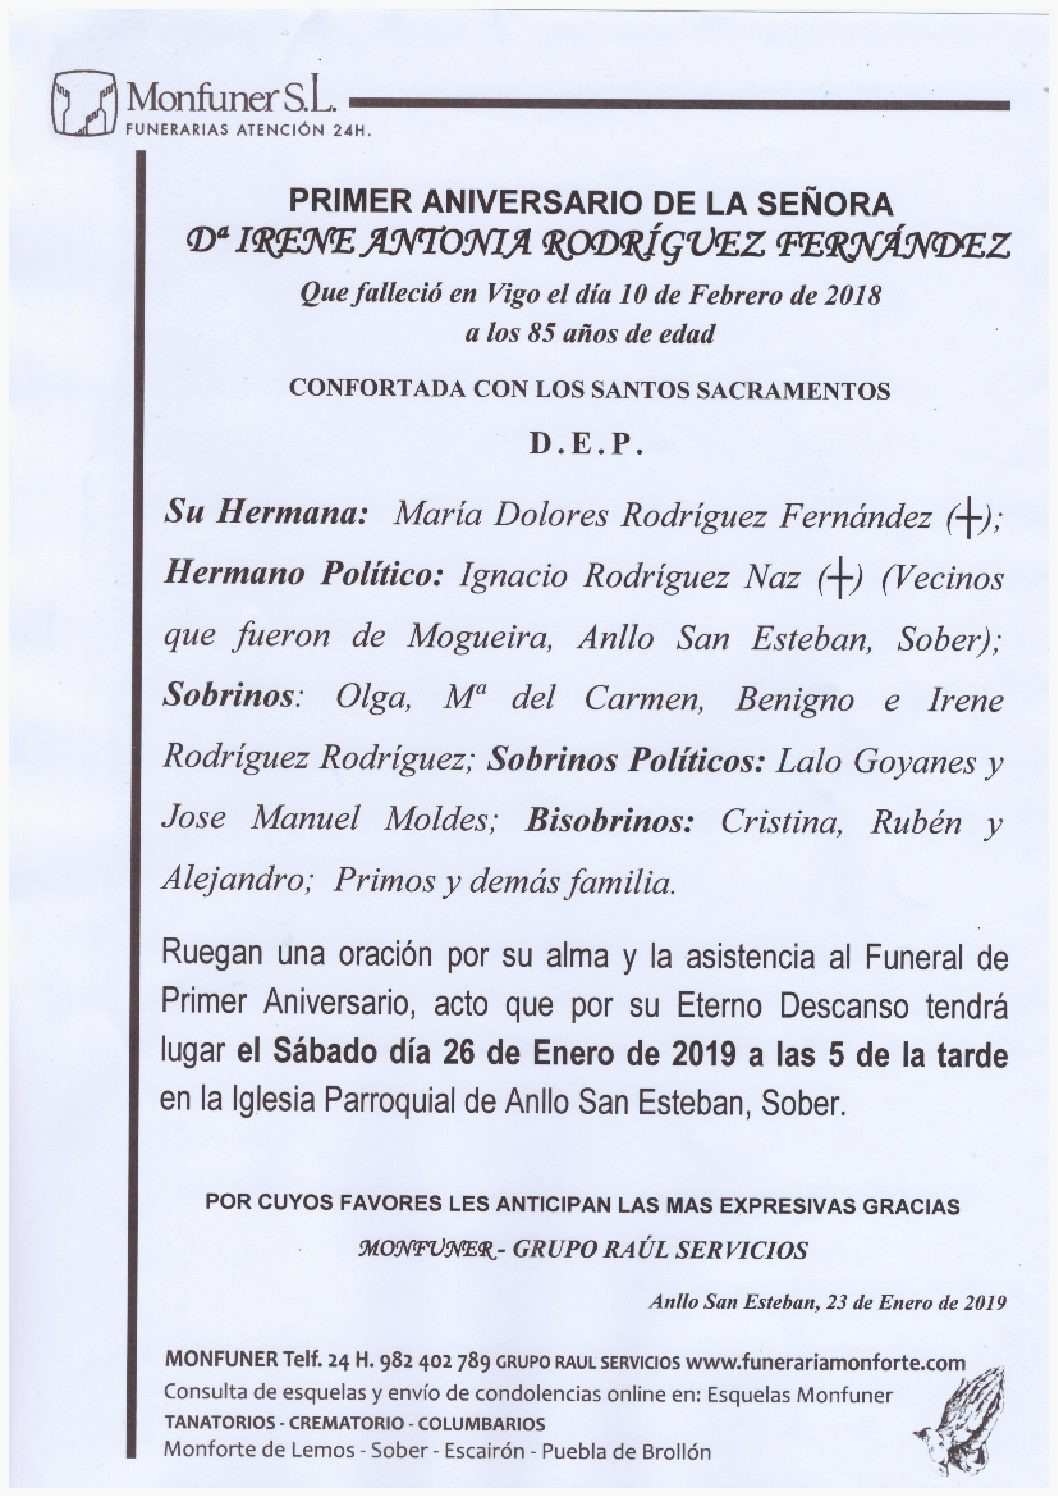 PRIMER ANIVERSARIO DE DOÑA IRENE ANTONIA RODRIGUEZ FERNANDEZ